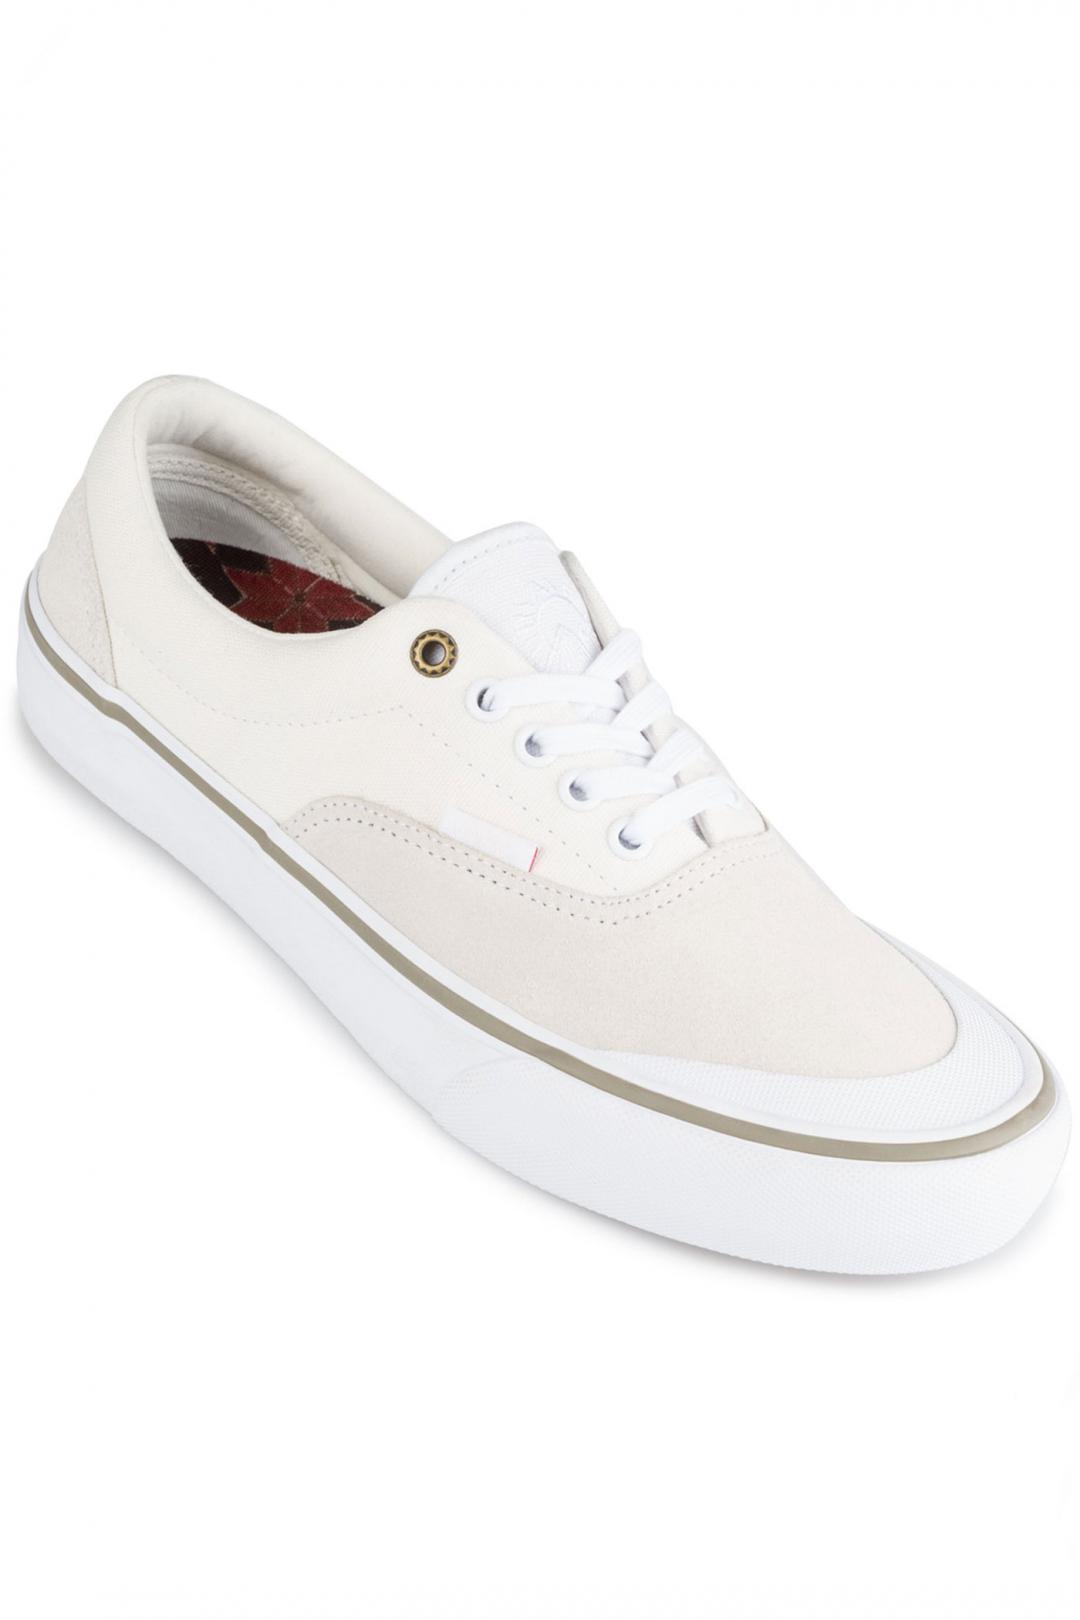 Uomo Vans Era Pro dakota roche marshmallow white | Sneaker